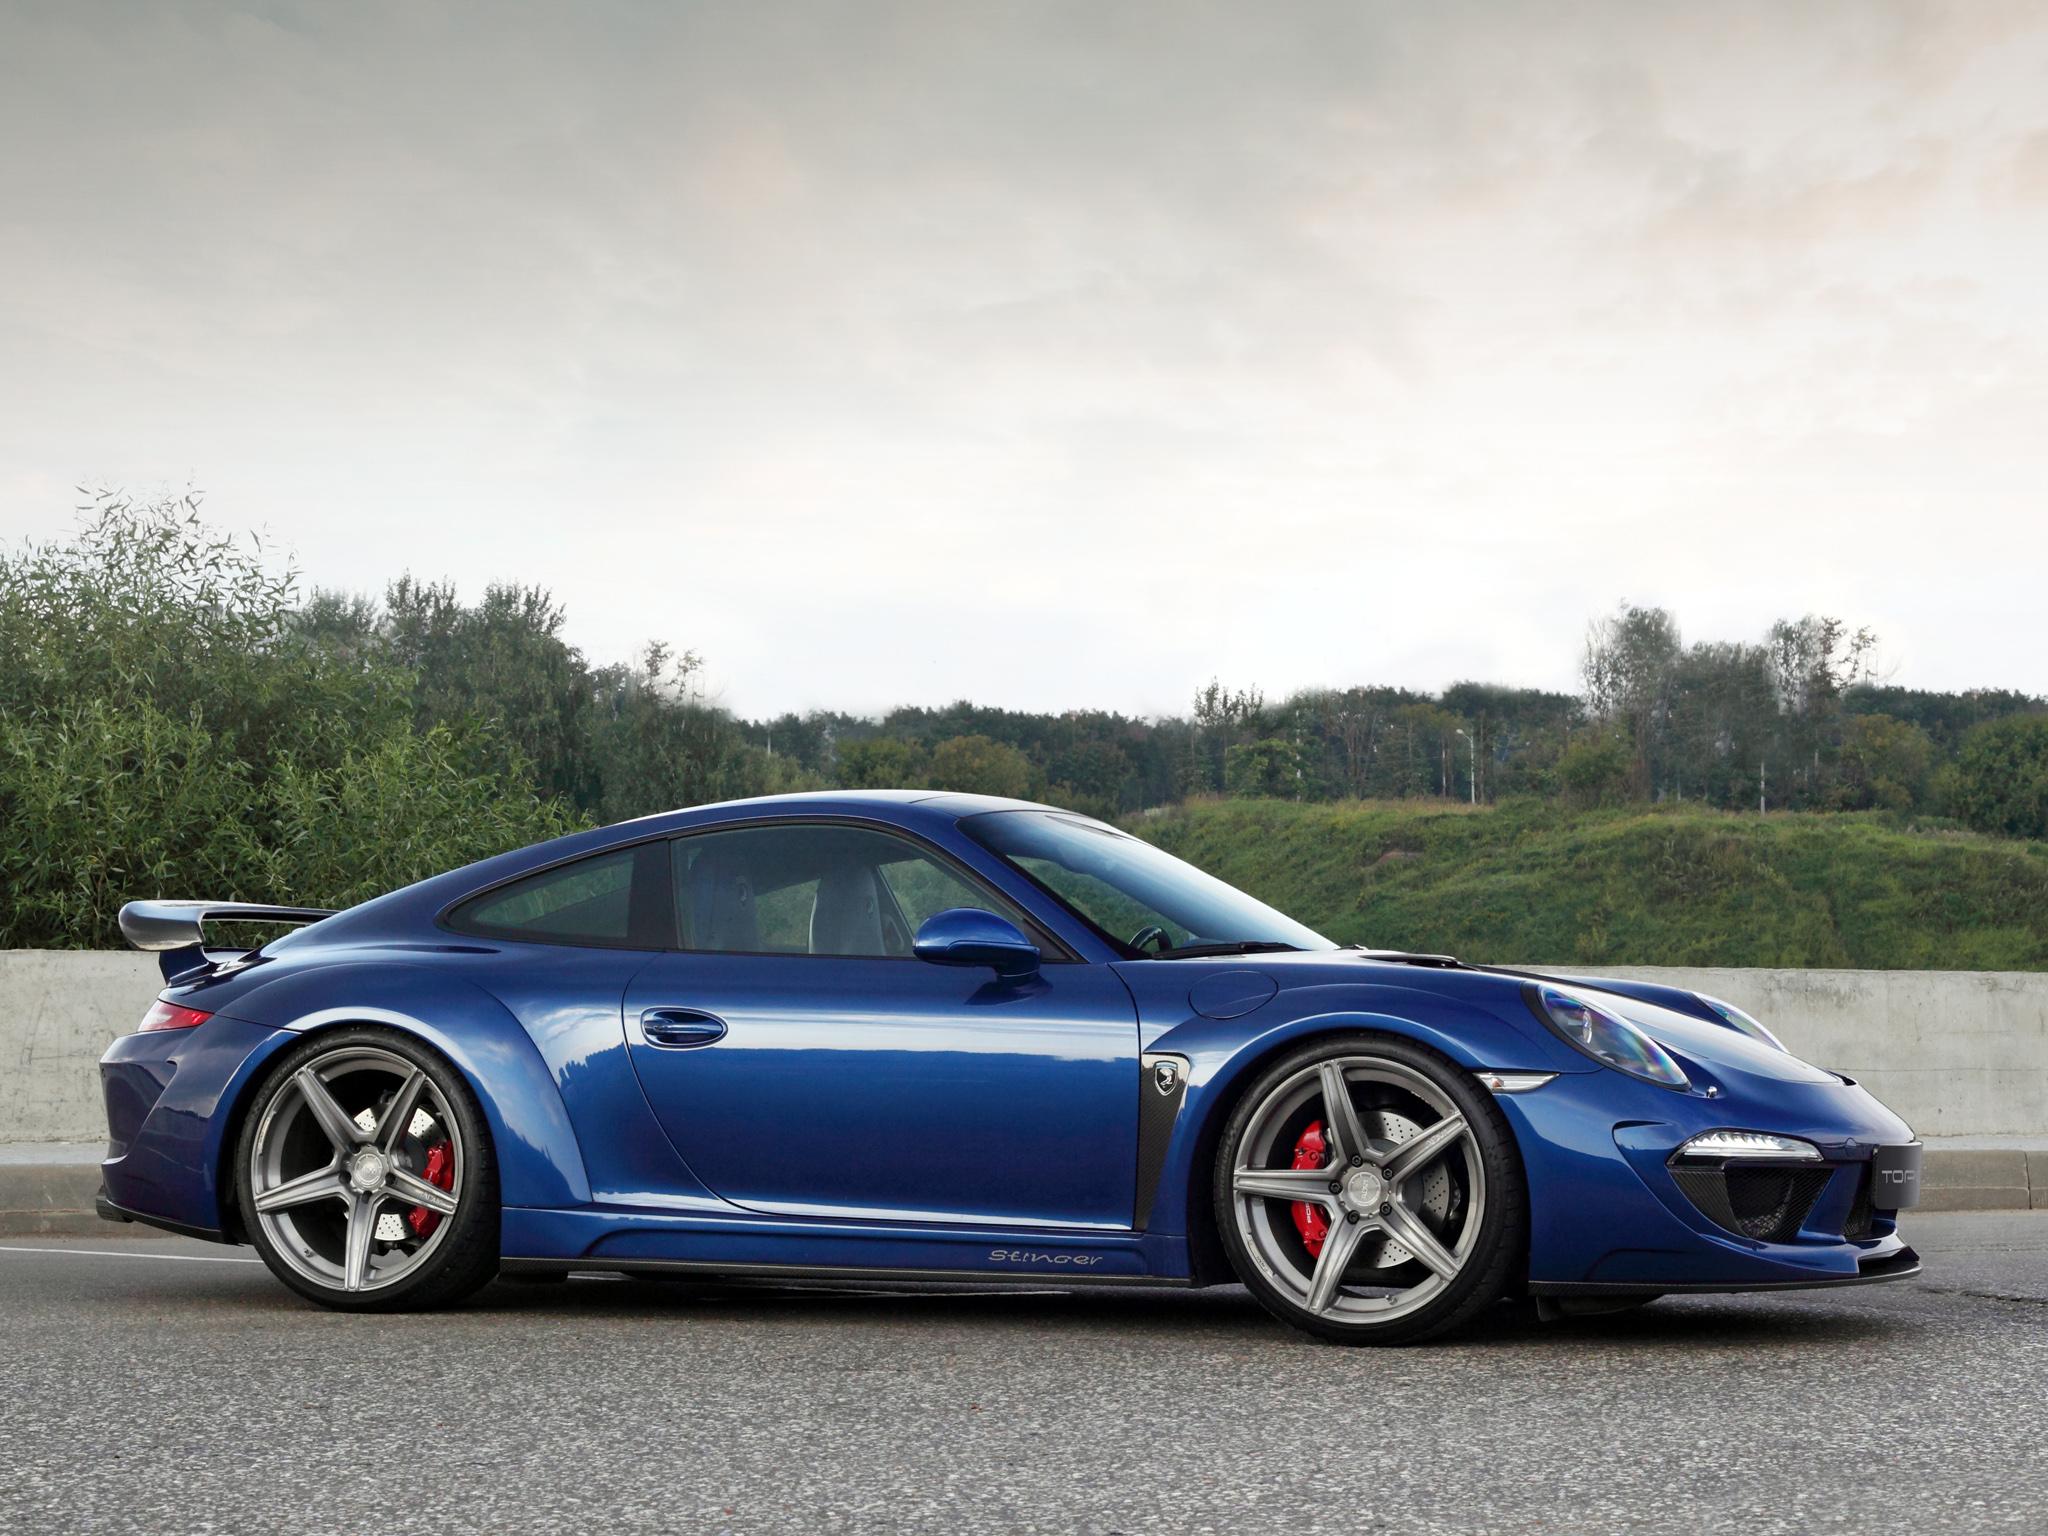 2013 topcar porsche 911 carrera stinger 991 tuning. Black Bedroom Furniture Sets. Home Design Ideas